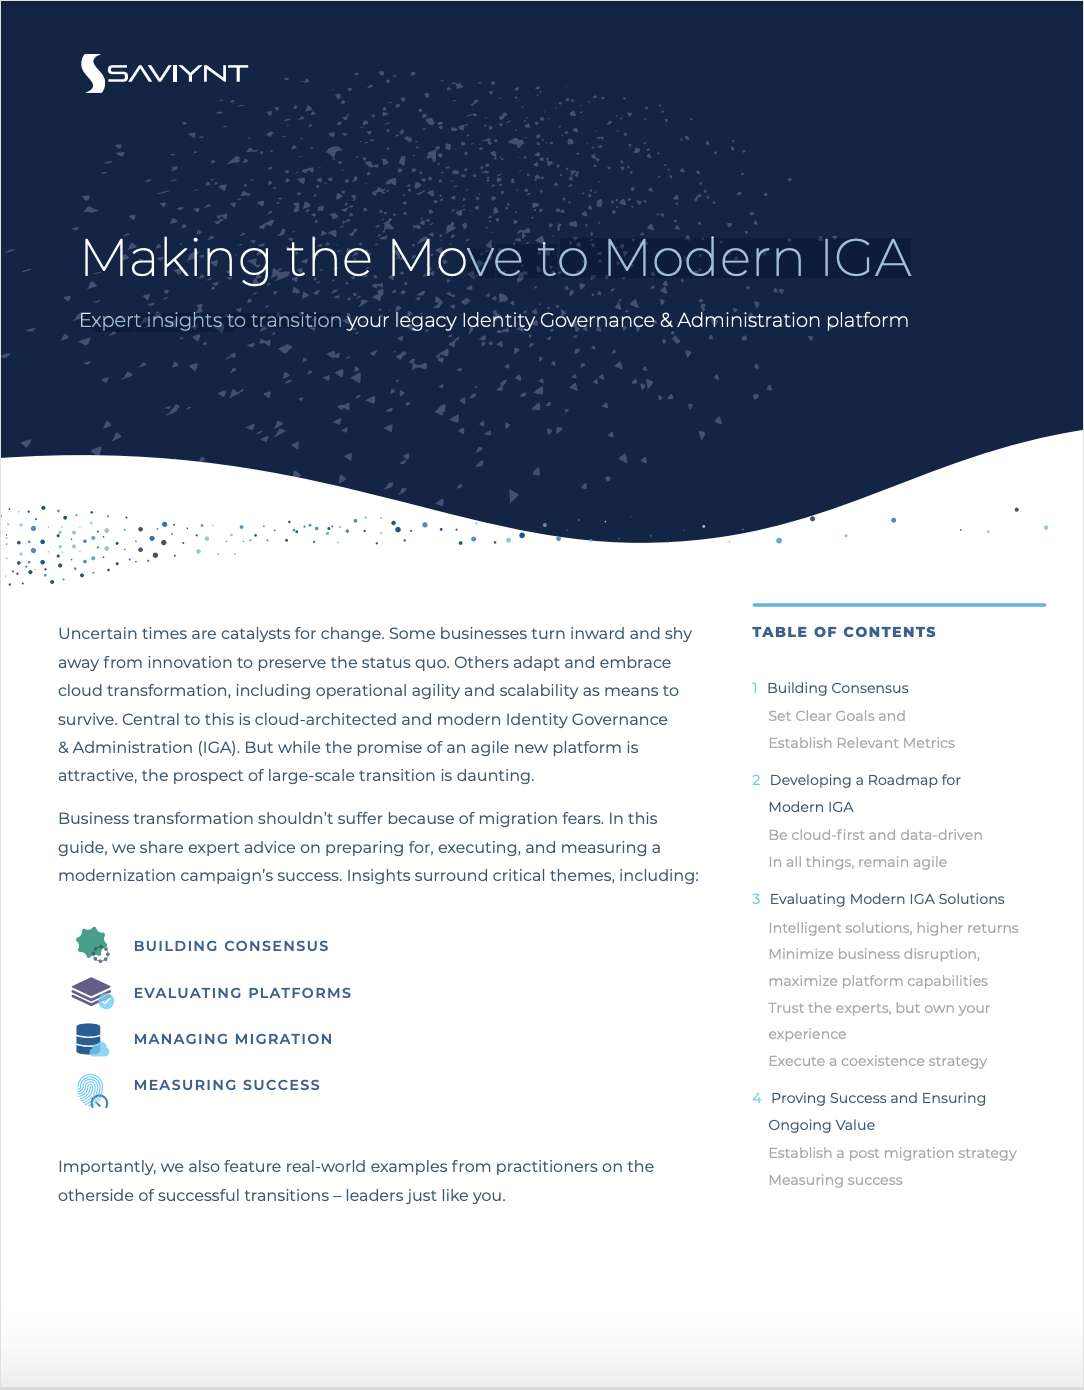 Making the Move to Modern IGA